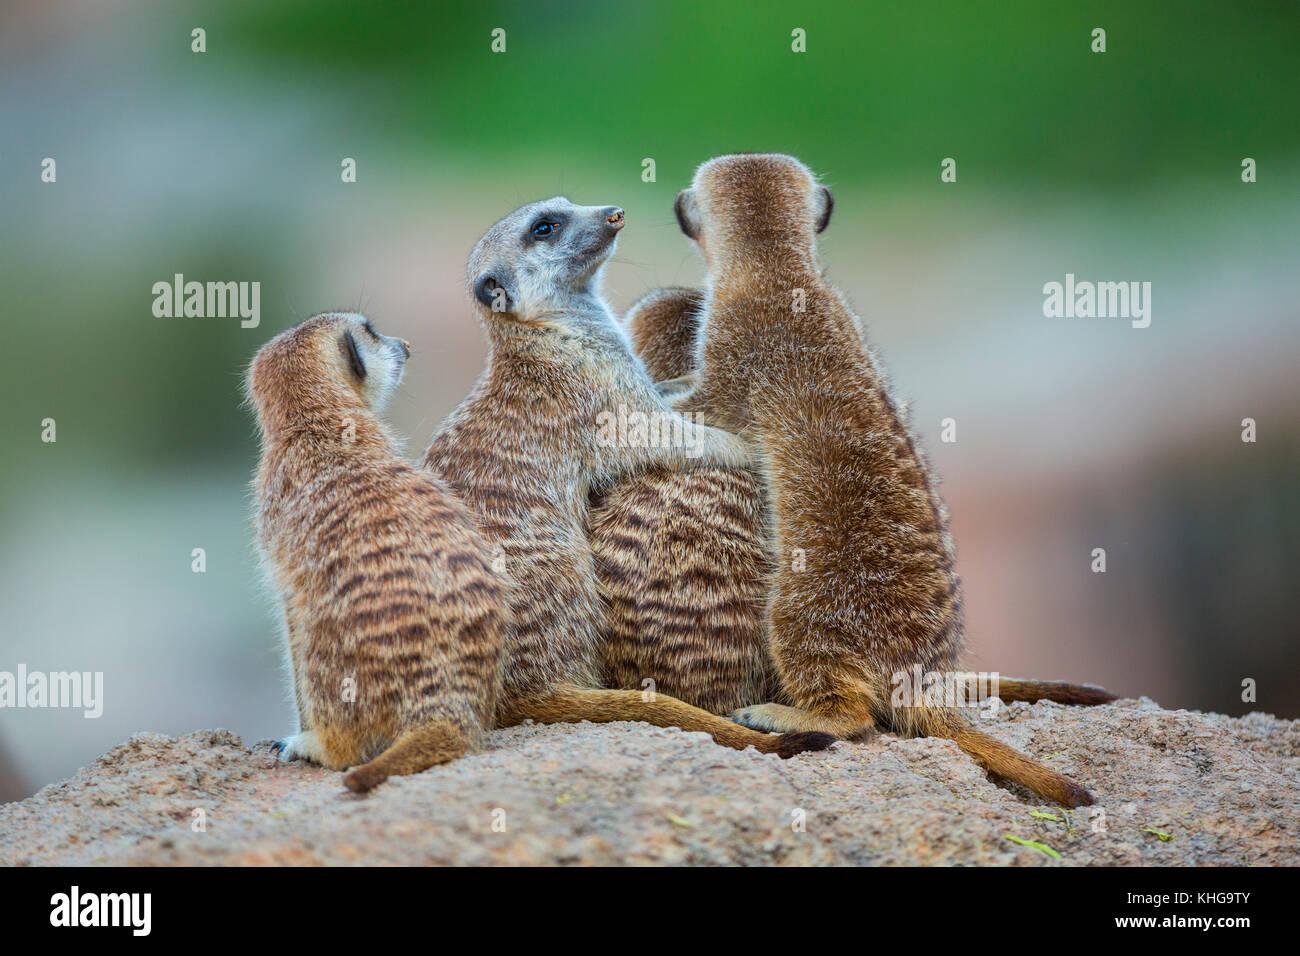 Family of meerkats. Meerkat or suricate (Suricata suricatta) Stock Photo